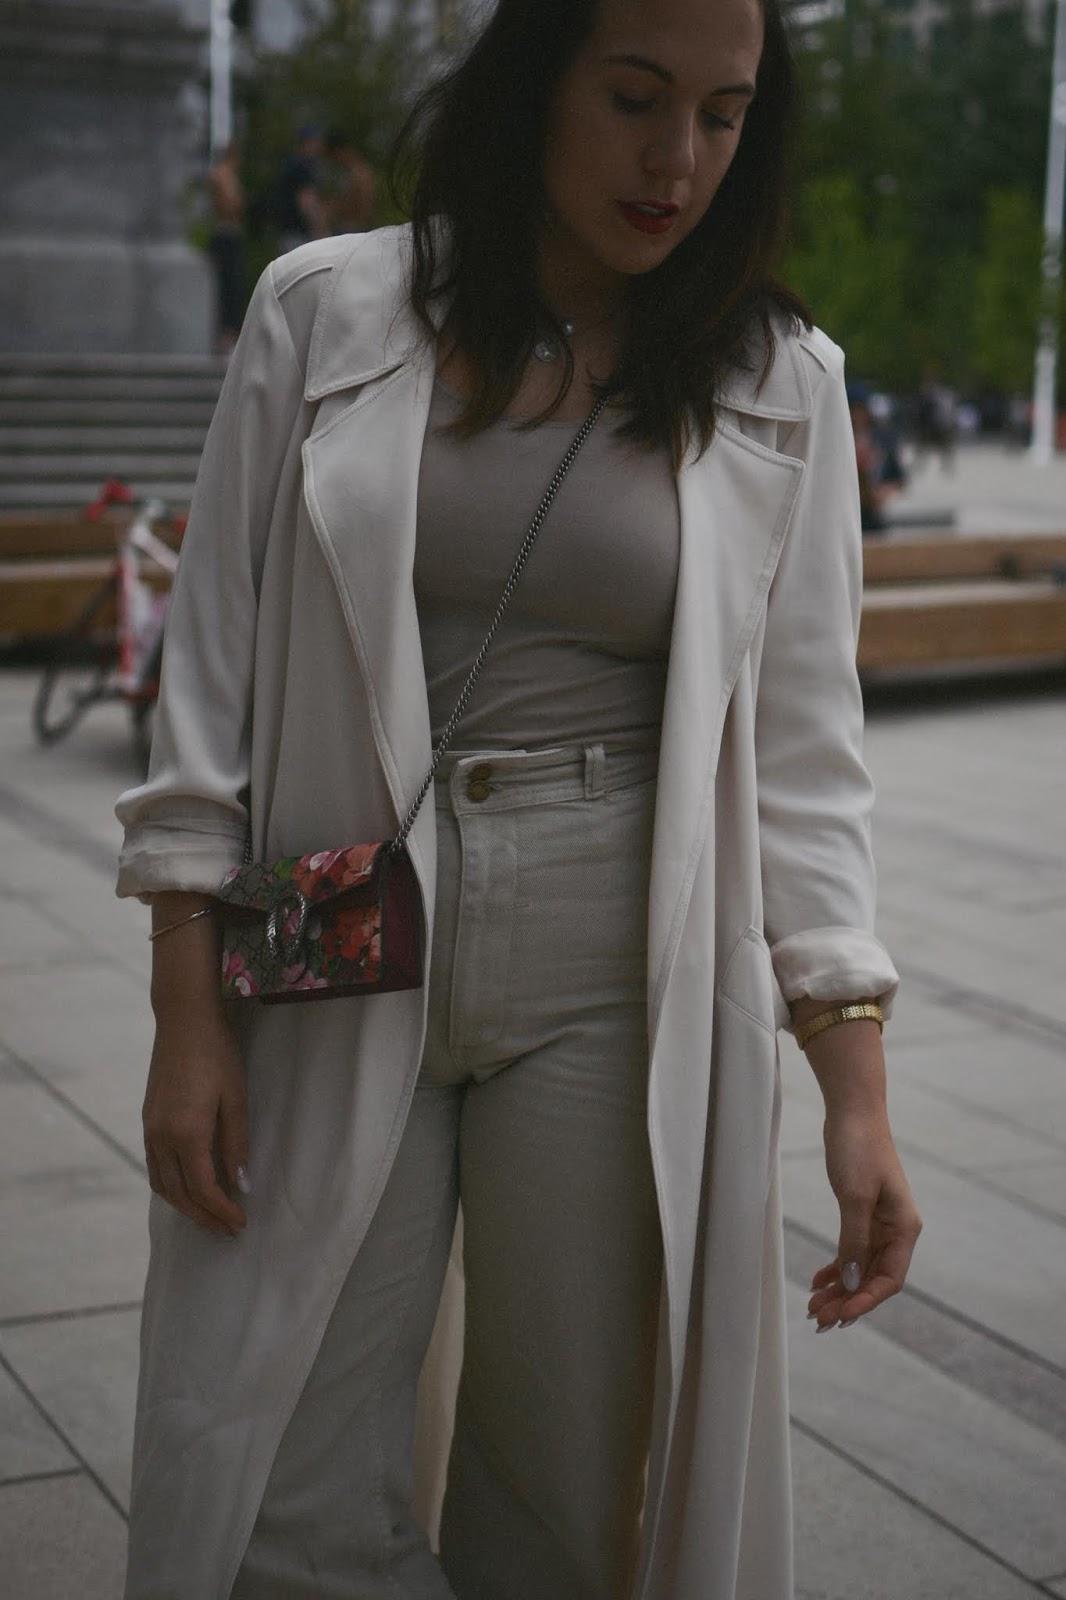 All beige outfit idea monochrome aritzia duster jacket thrills denim culottes le chateau suede mules gucci supreme mini bag